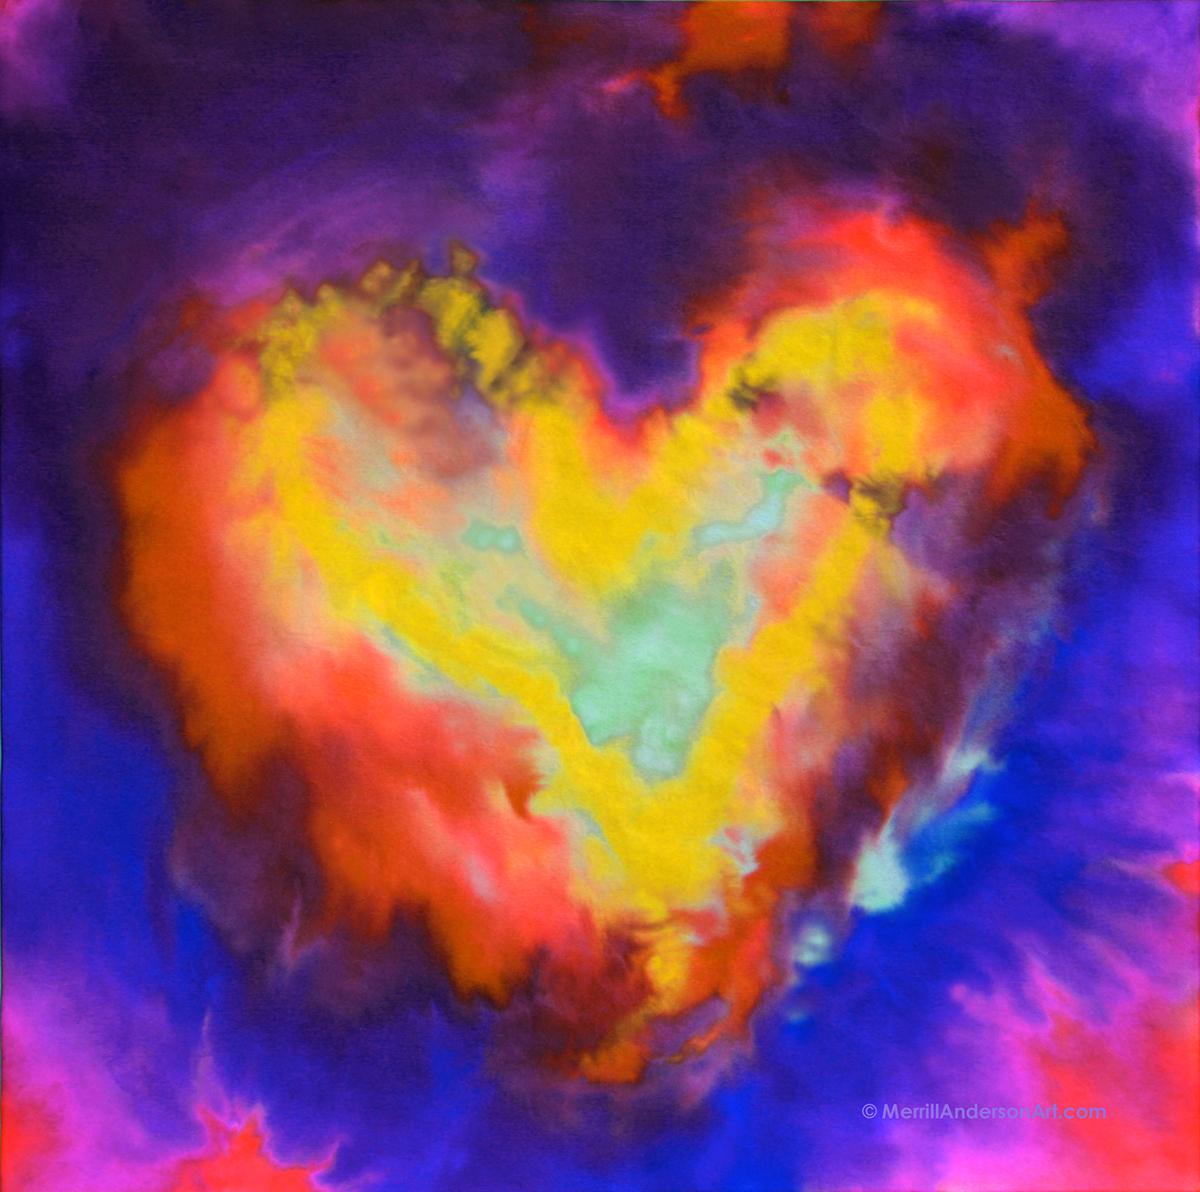 Adobe Portfolio hearts Love childlike inspiration cards screensavers Paintings valentines